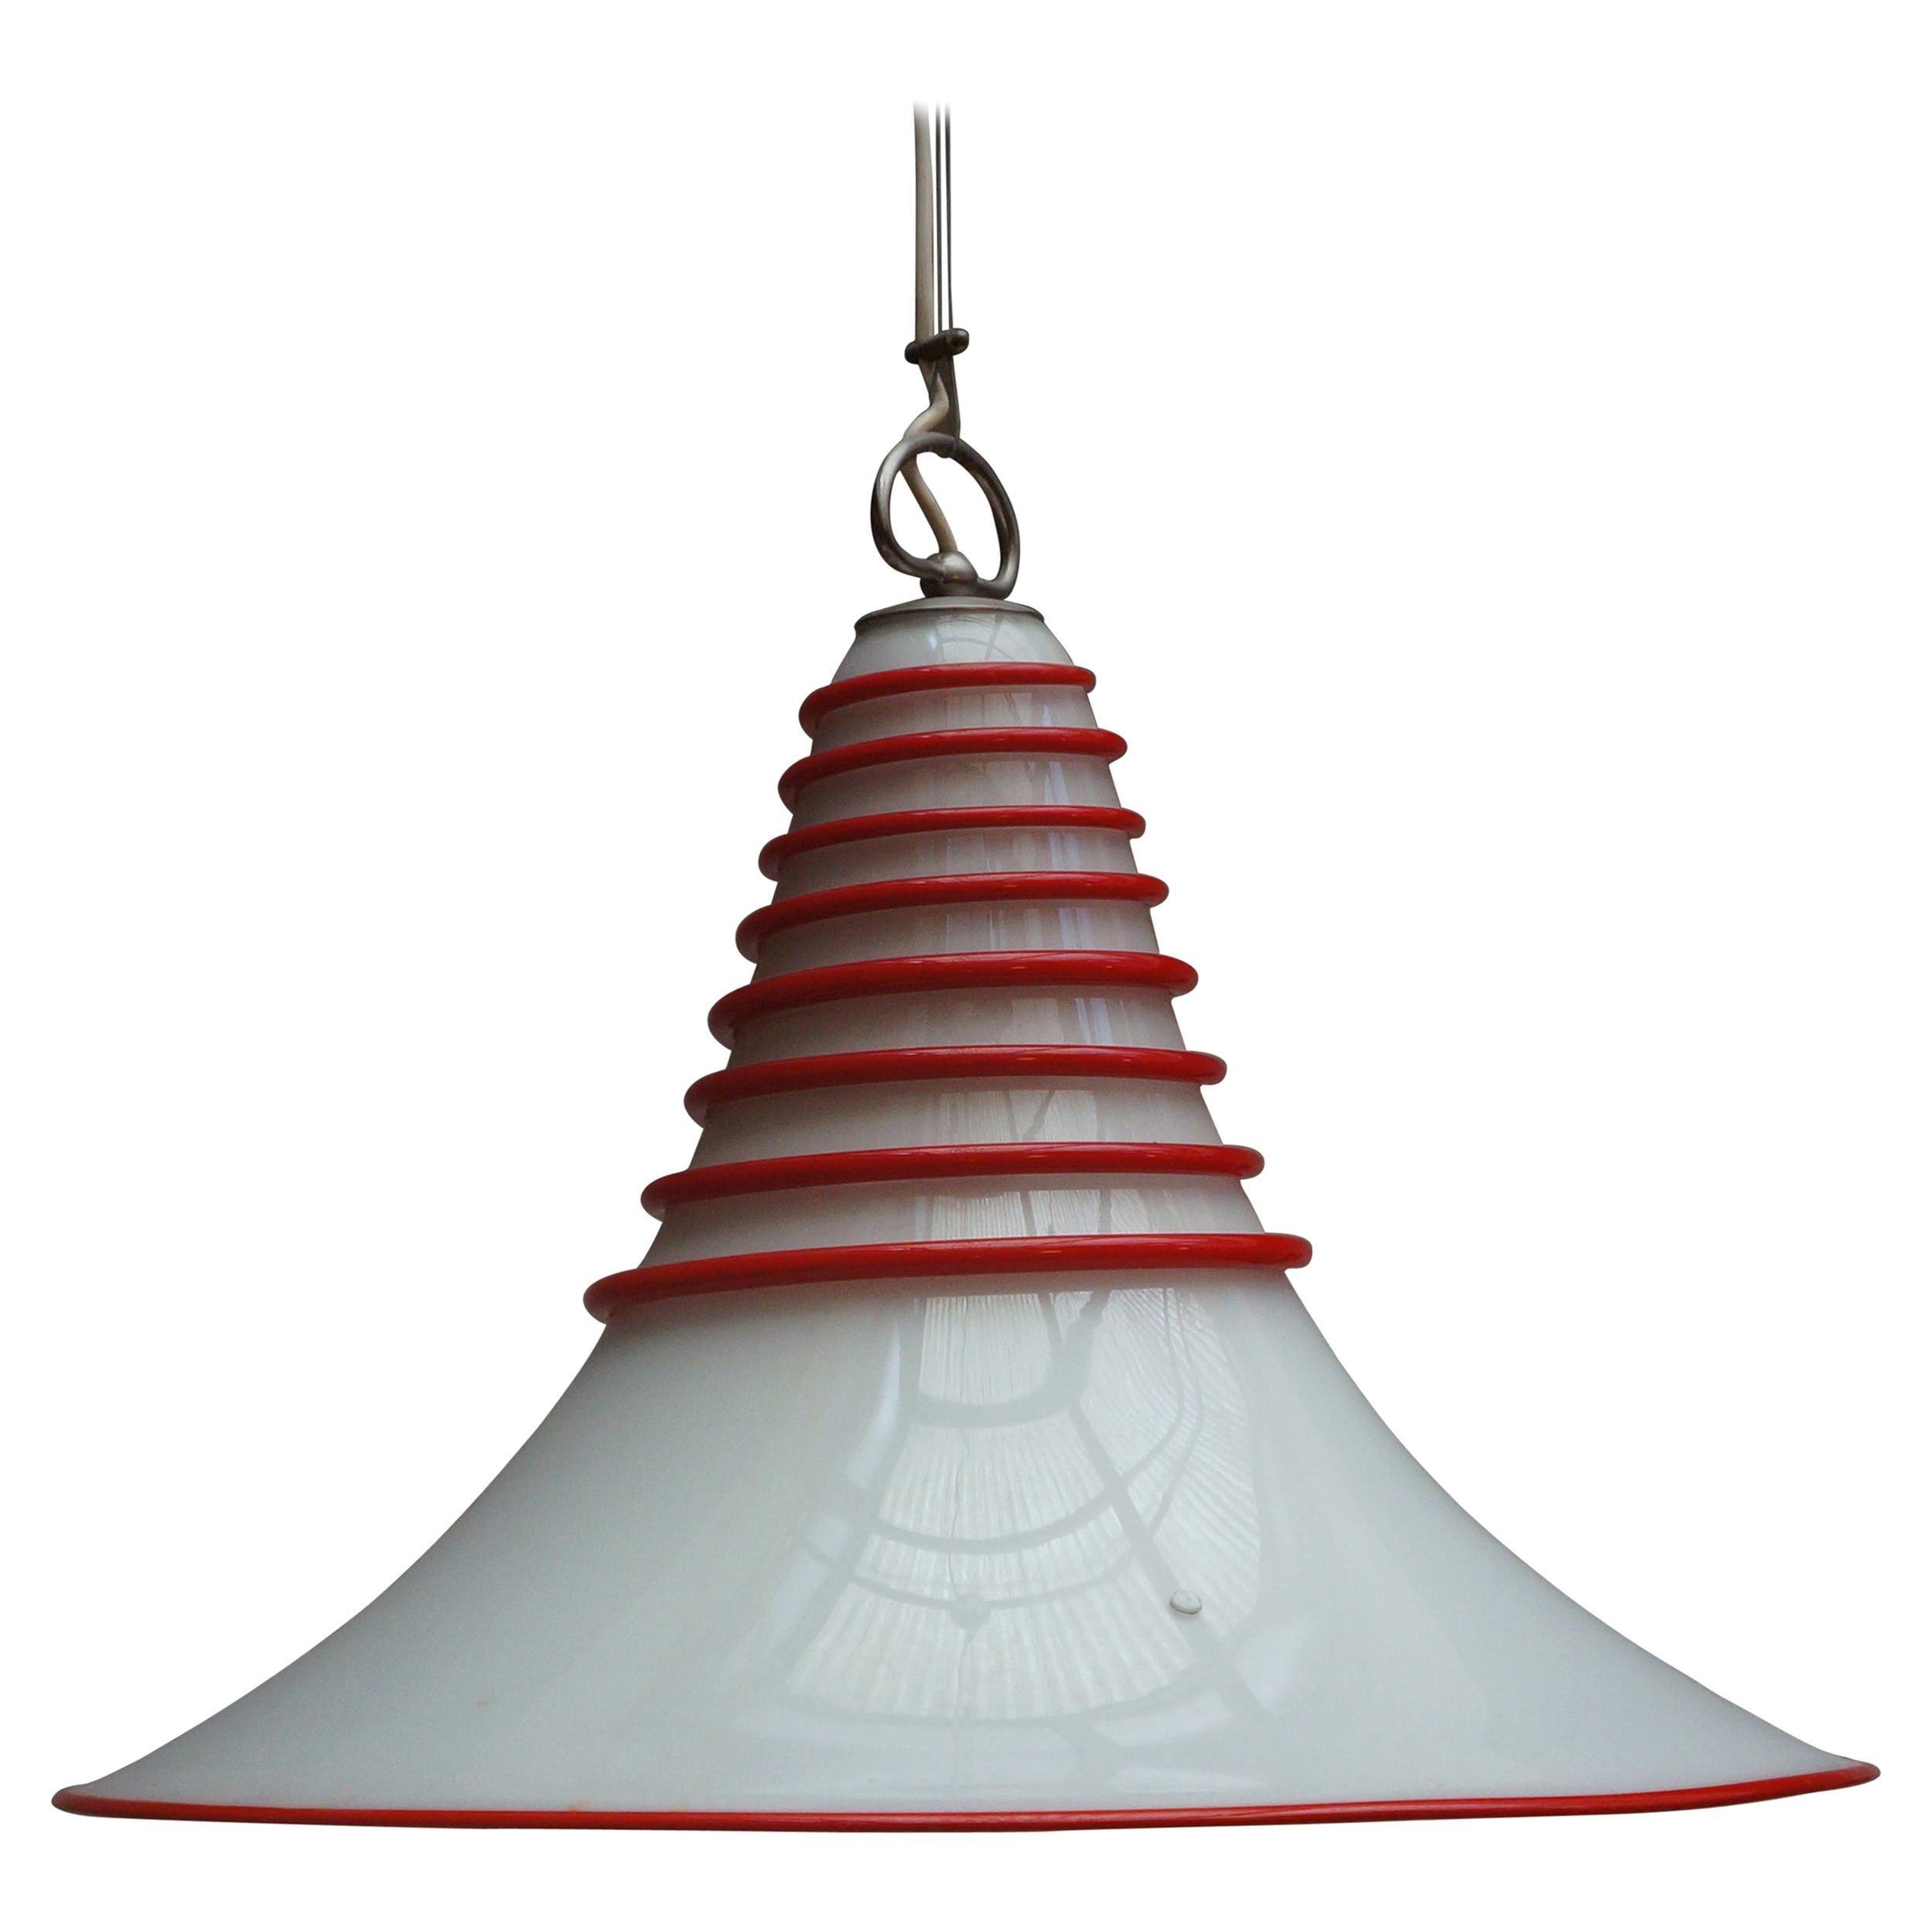 Two Vistosi Murano Glass Pendant Light in White and Red